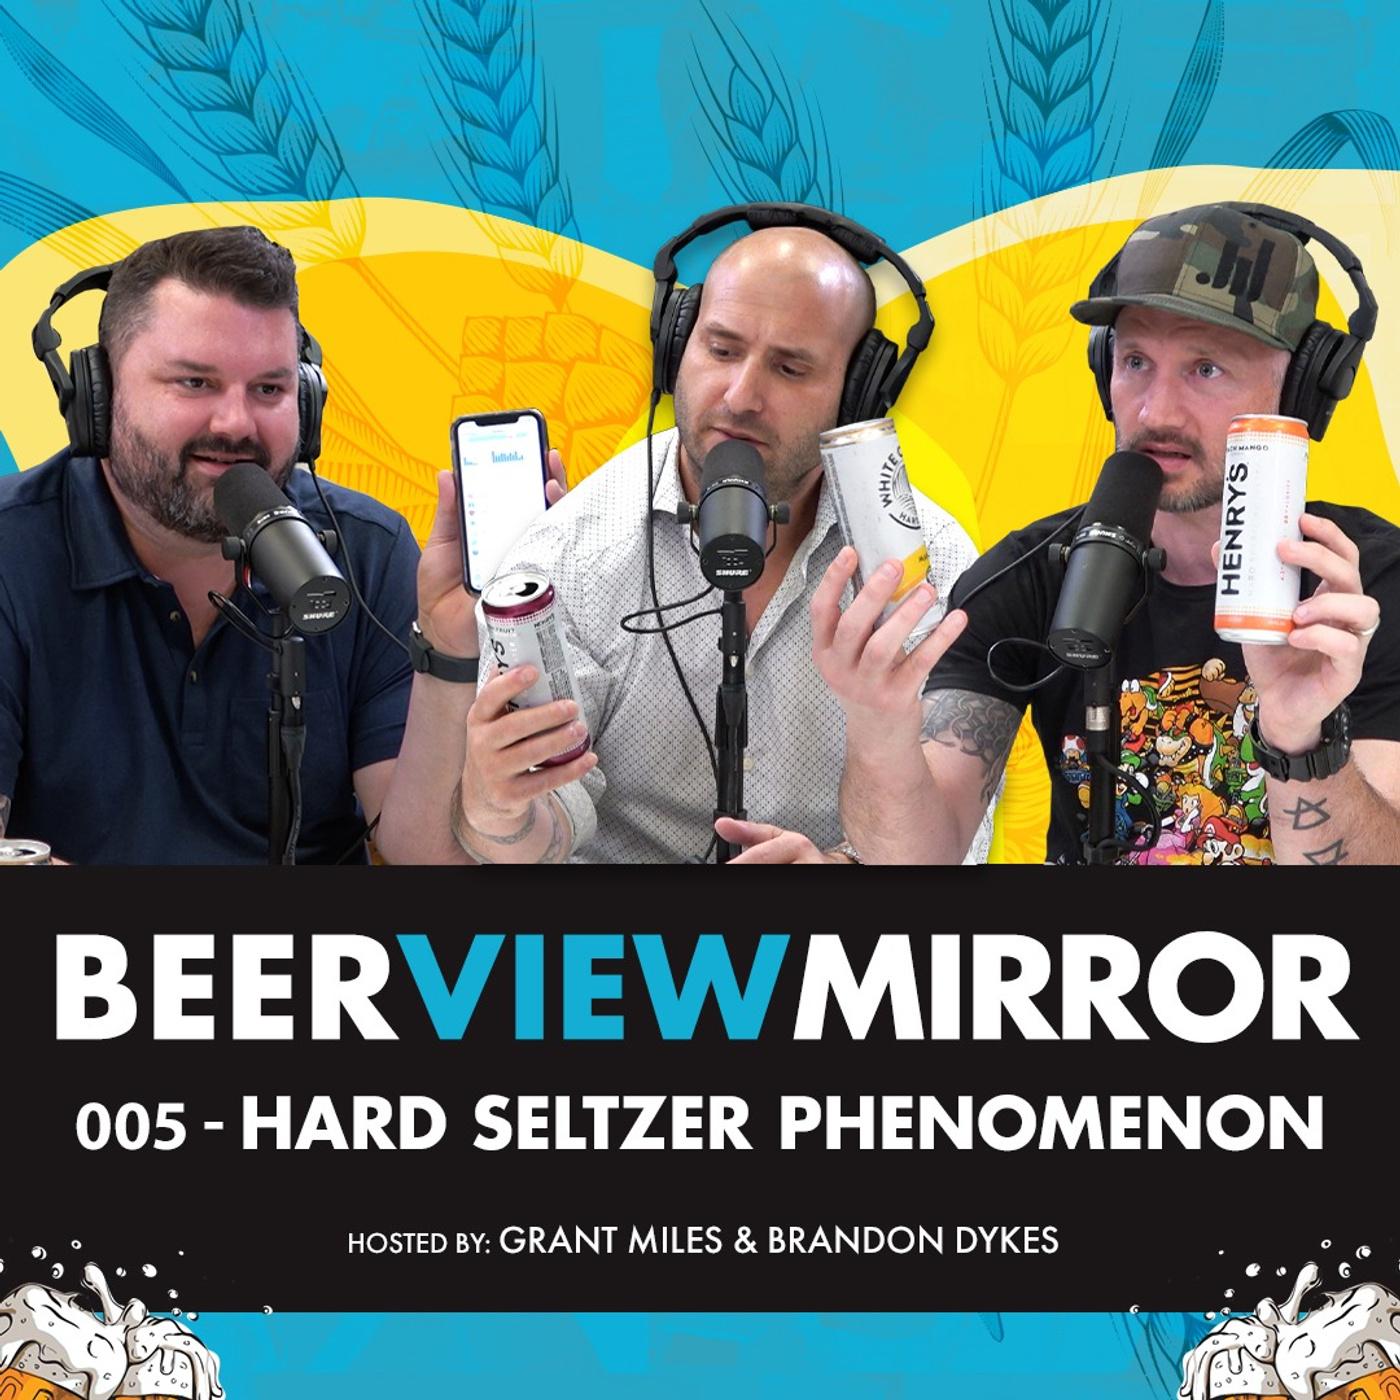 Beer View Mirror 005 Hard Seltzer Phenomenon